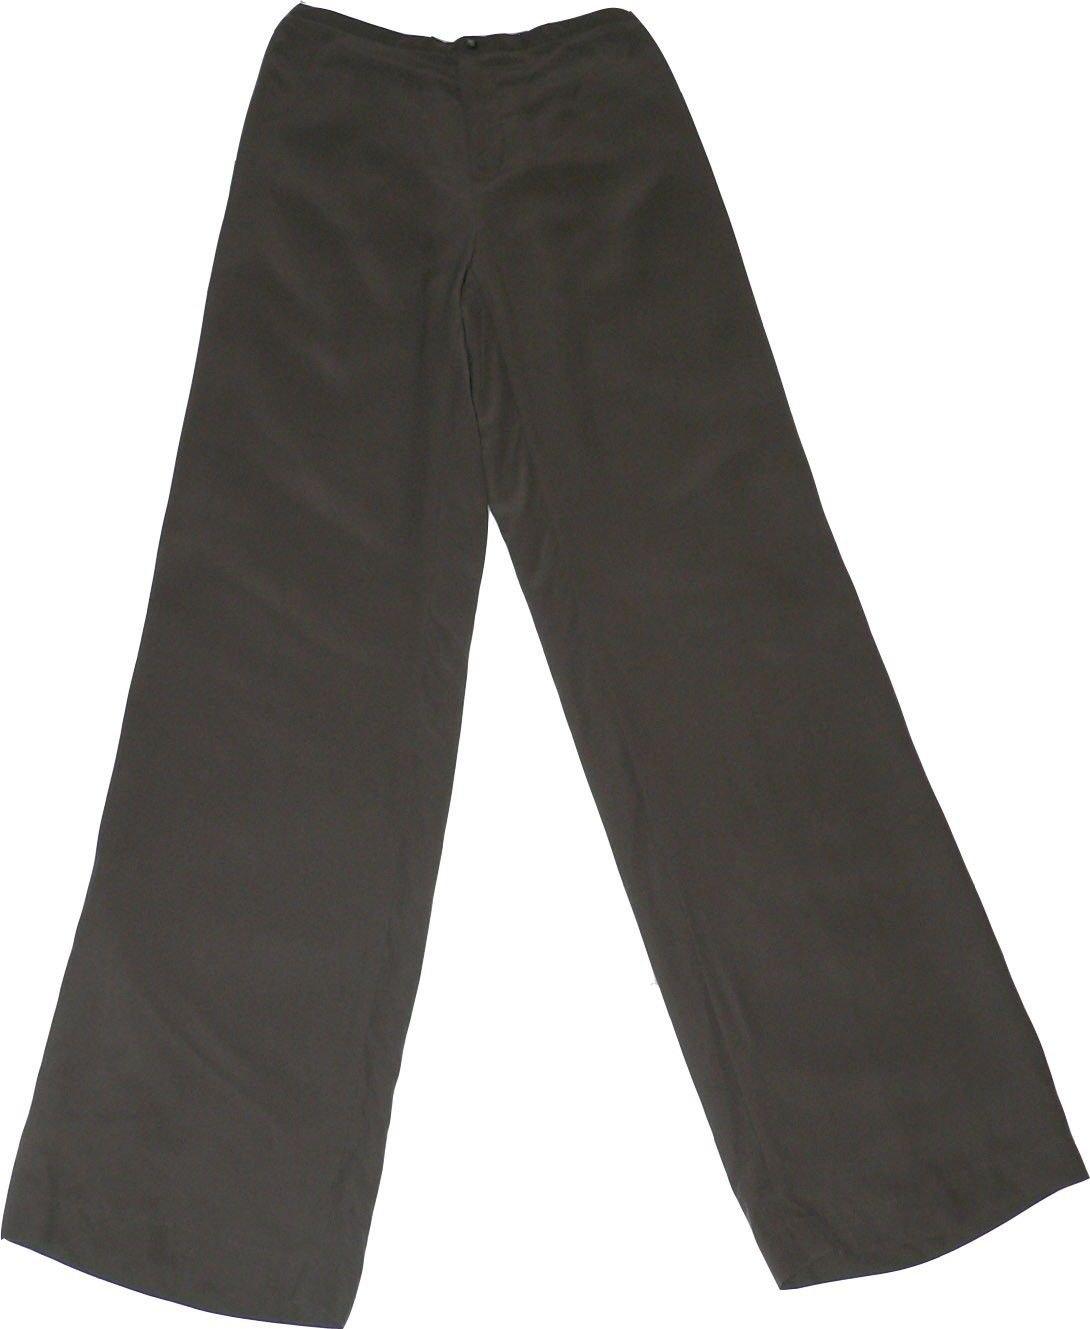 NWT DANA BUCHMAN Silk dress pants slacks trousers XS career designer Cocoa